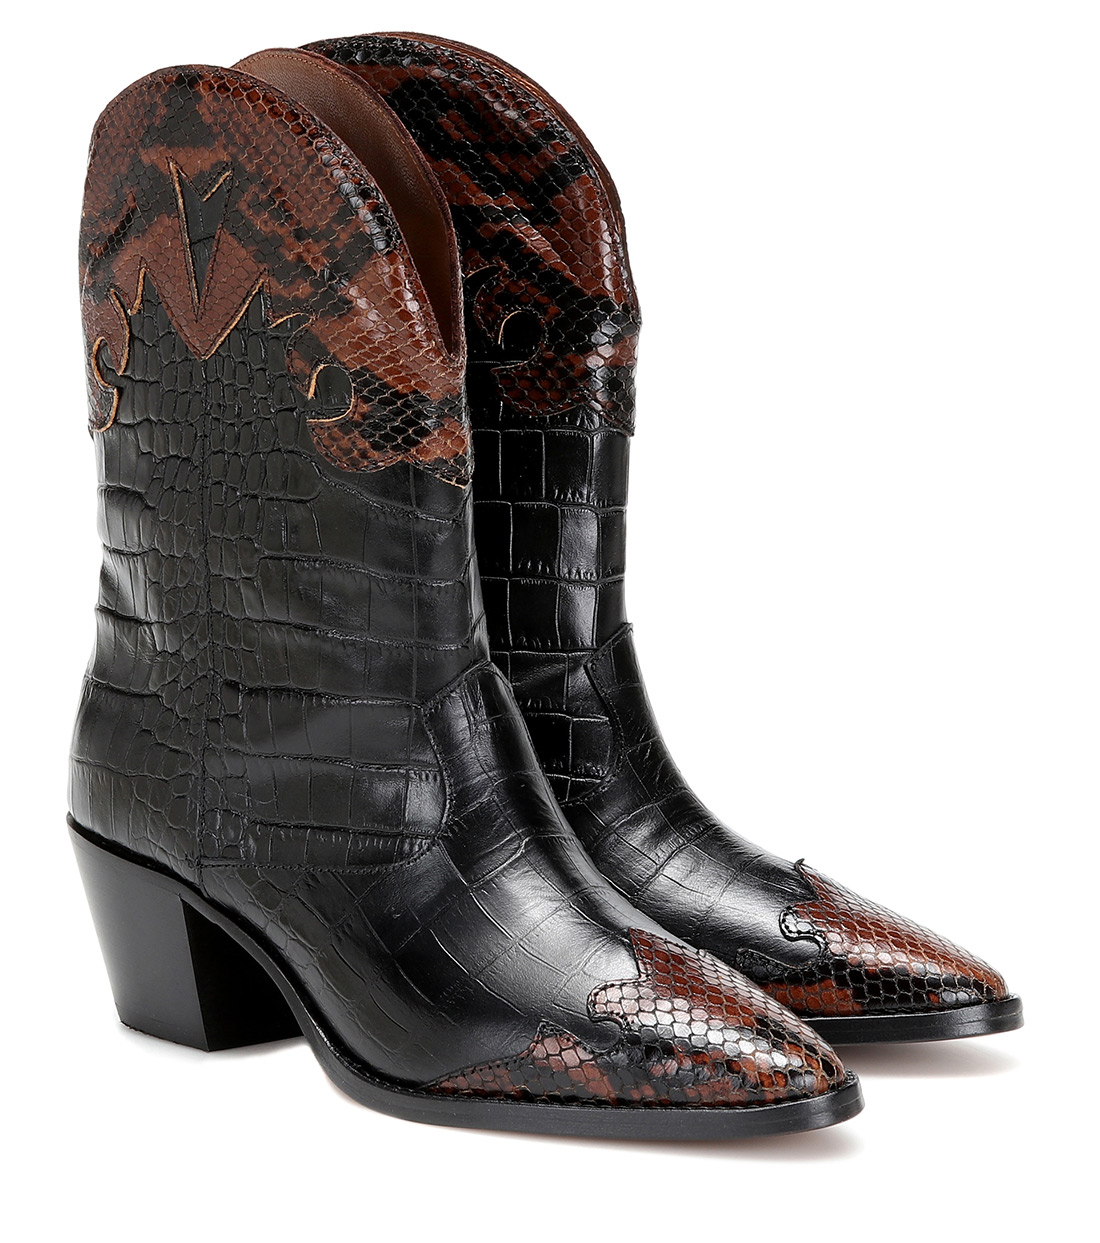 street style zagreb ženska moda jesen zima 2019/2020 kako kombinirati zmijski uzorka špica zagreb zagrebačka špica asos topshop h&m mytheresa designers look Paris Texas cowboy boots